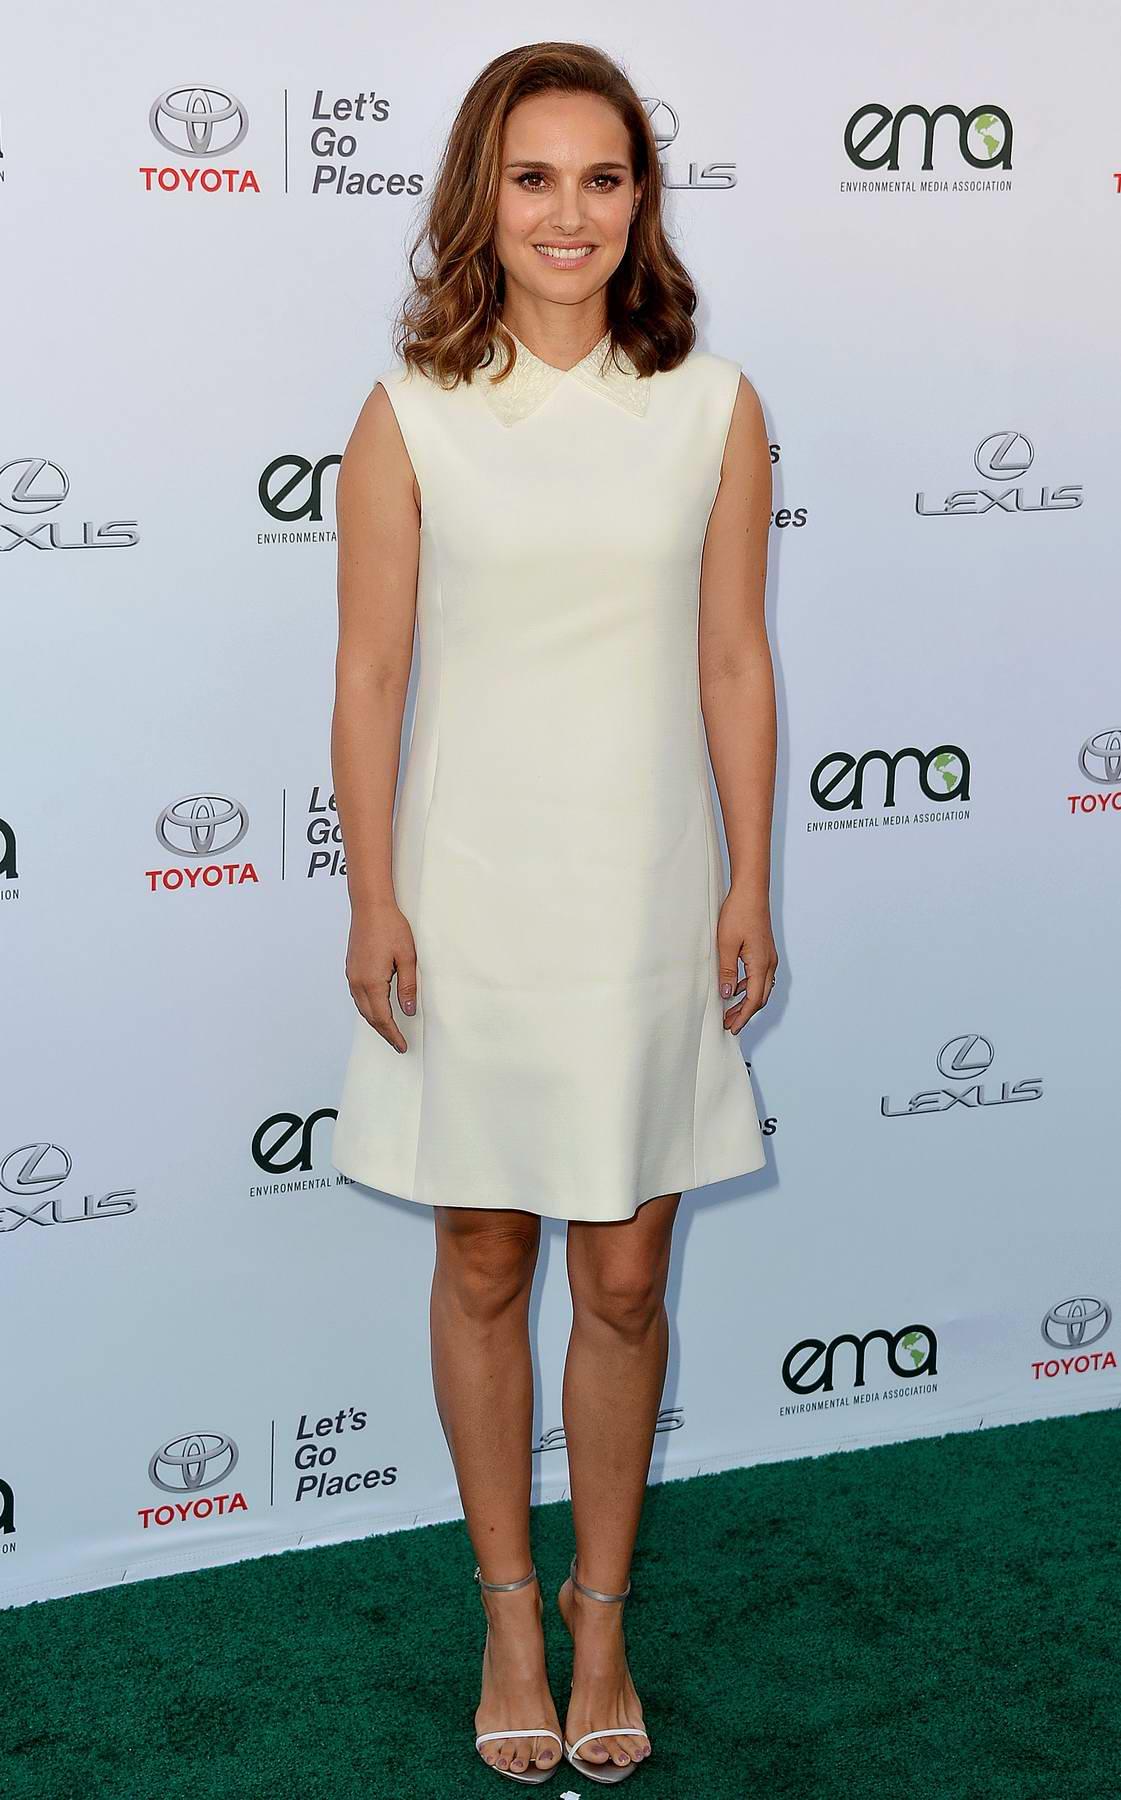 Natalie Portman at the Environmental Media Association Awards in Los Angeles